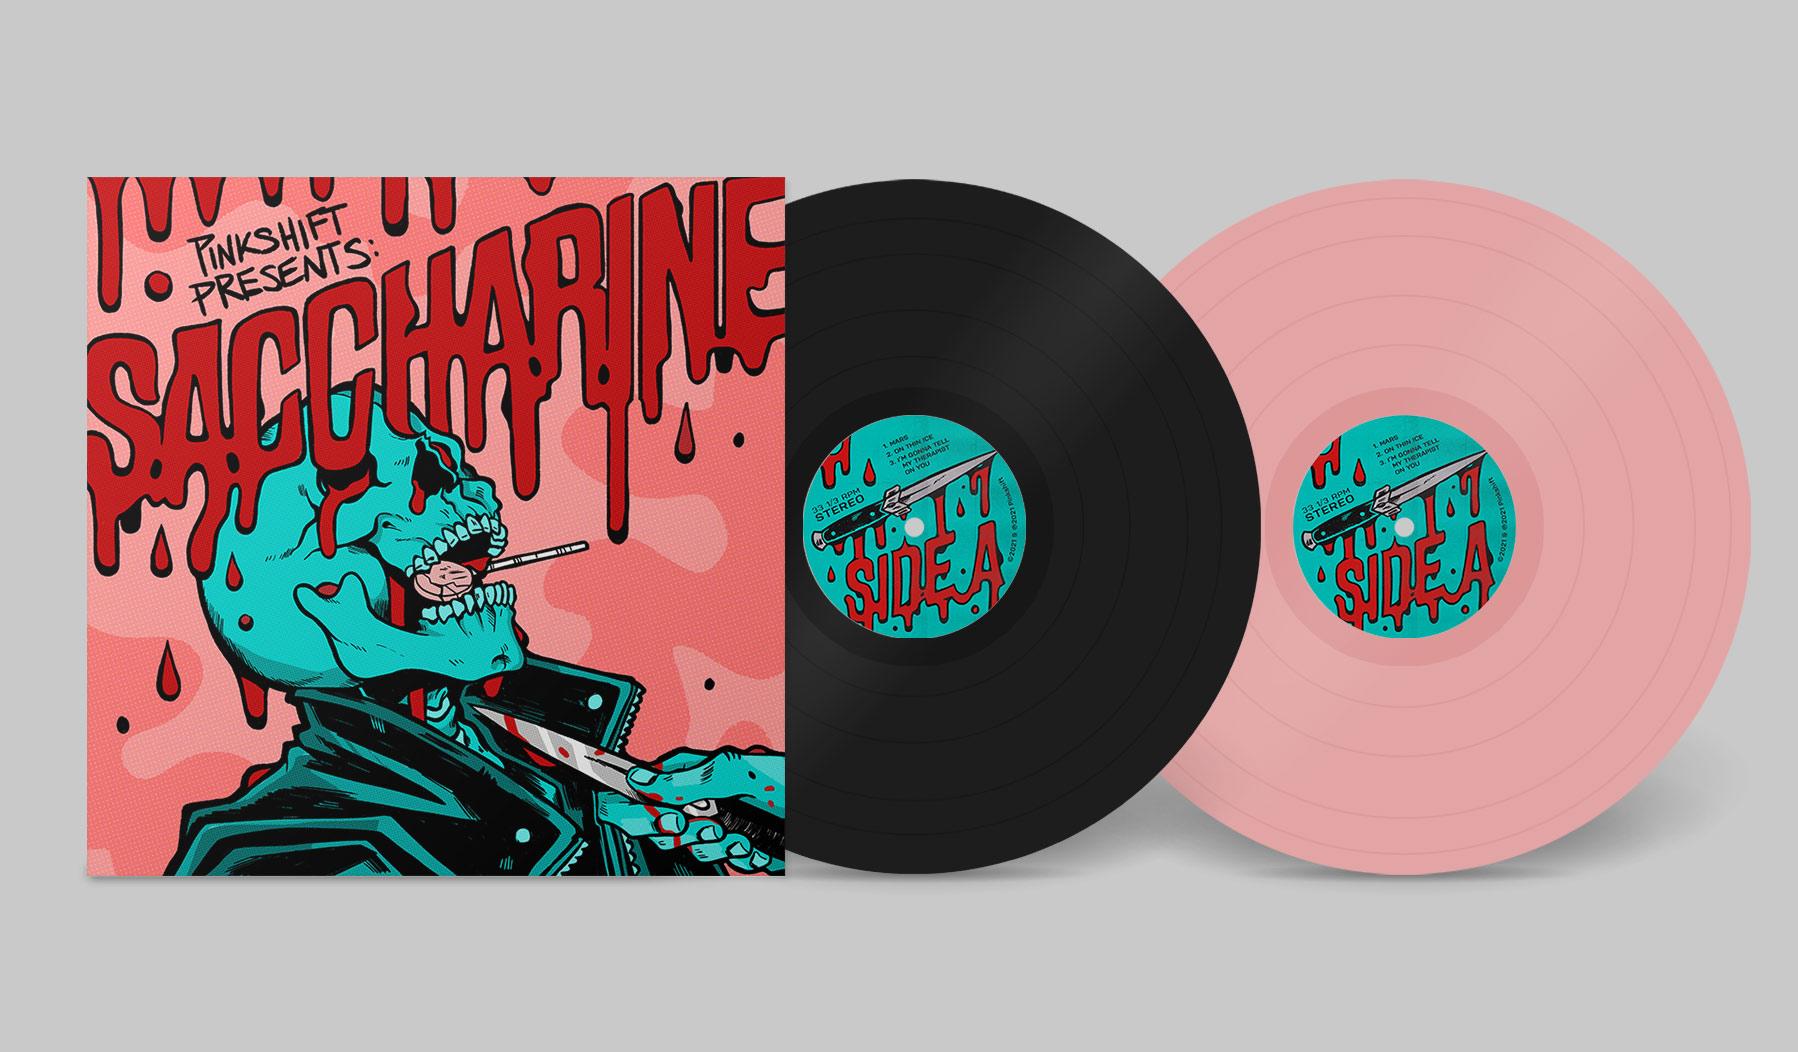 Saccharine LP, Limited Edition